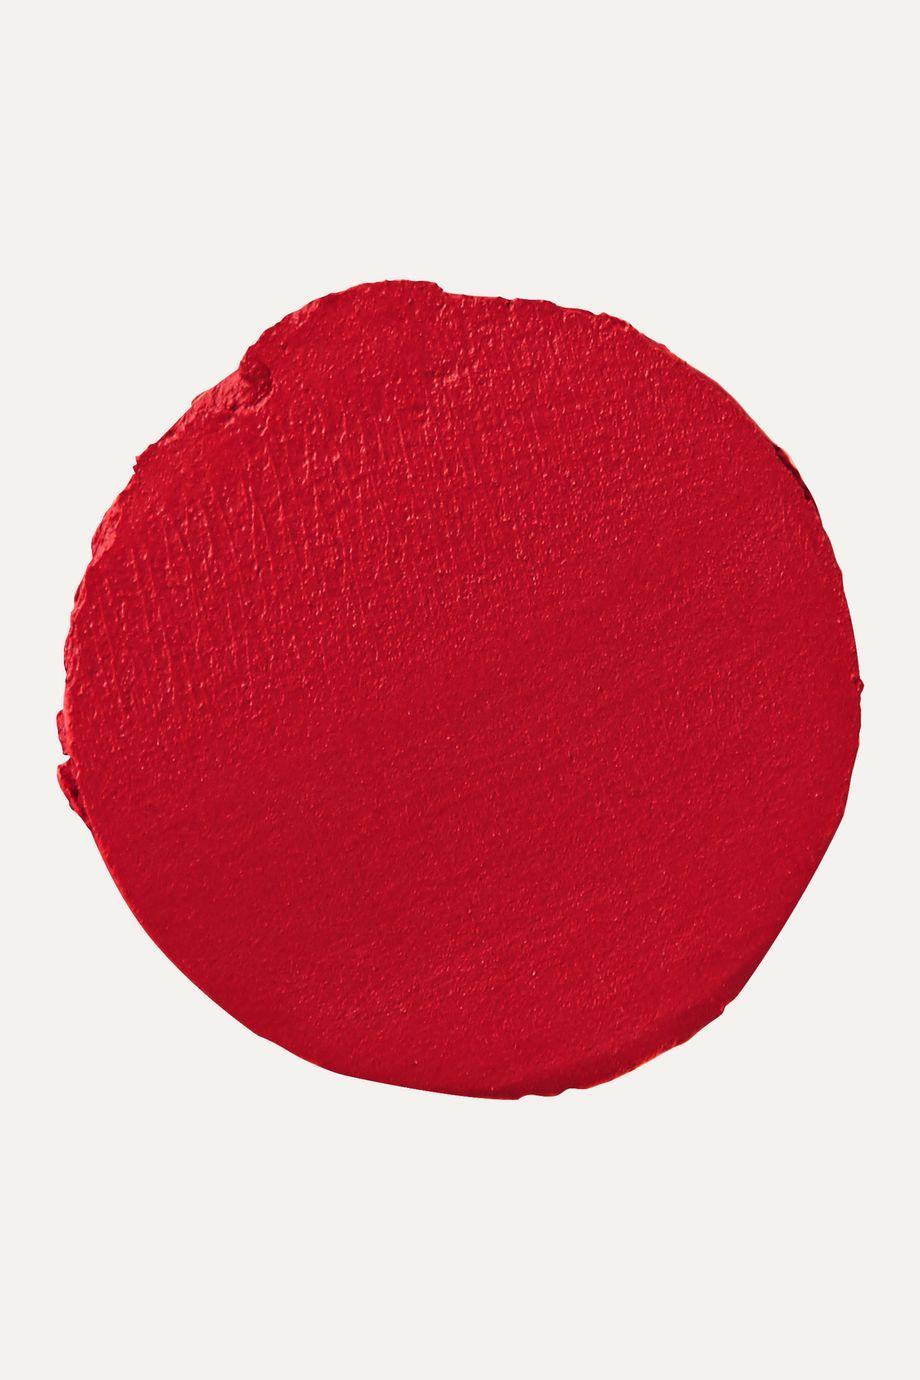 Pat McGrath Labs Lip Fetish Lip Balm - Wild Cherry